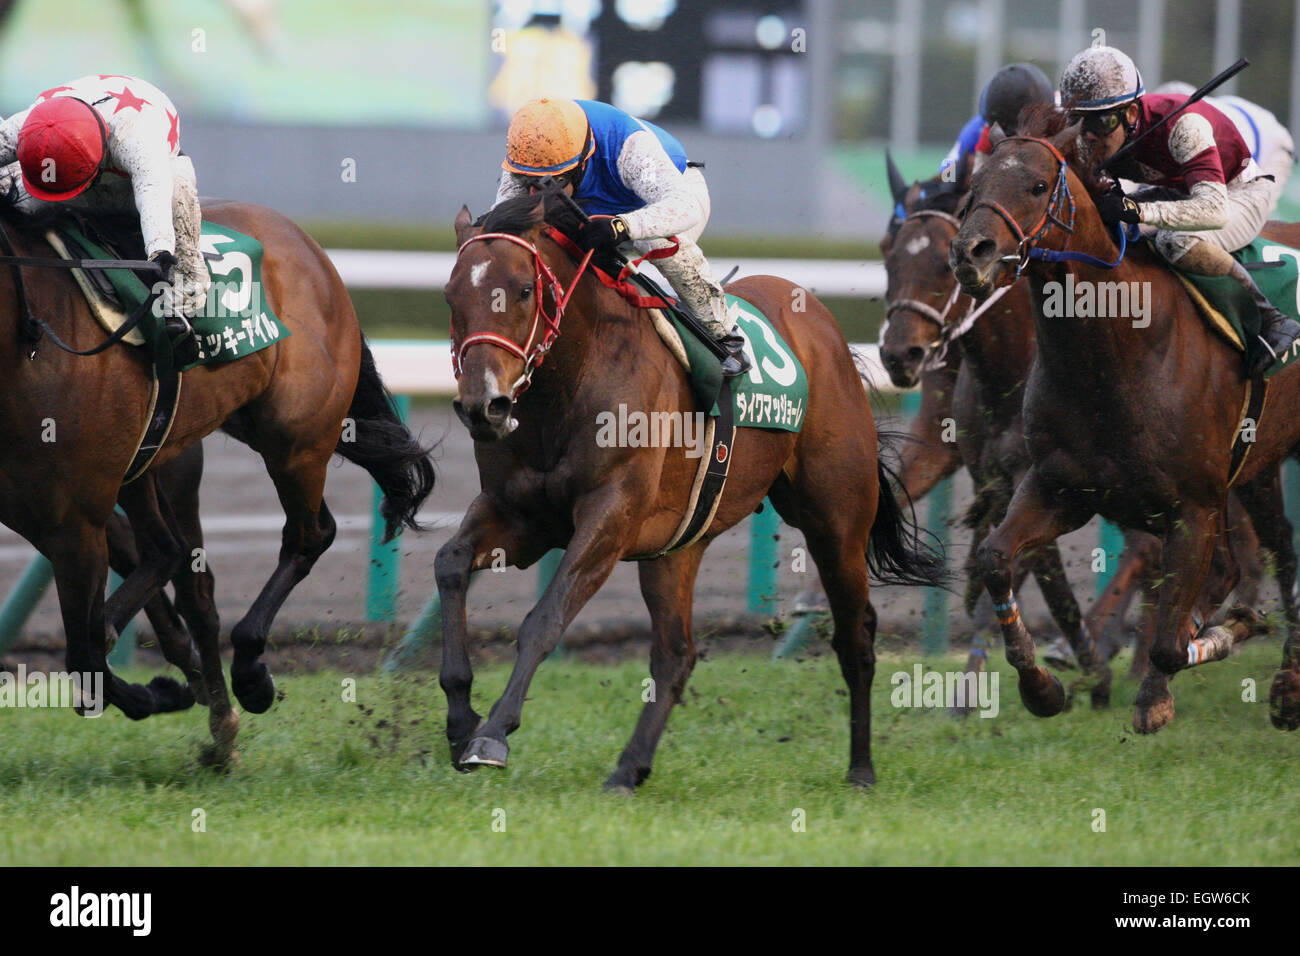 Hyogo, Japan. 1st Mar, 2015. (C-R) Daiwa Maggiore ( Mirco Demuro), Sudden Storm (Yusaku Kokubun) Horse Racing : - Stock Image